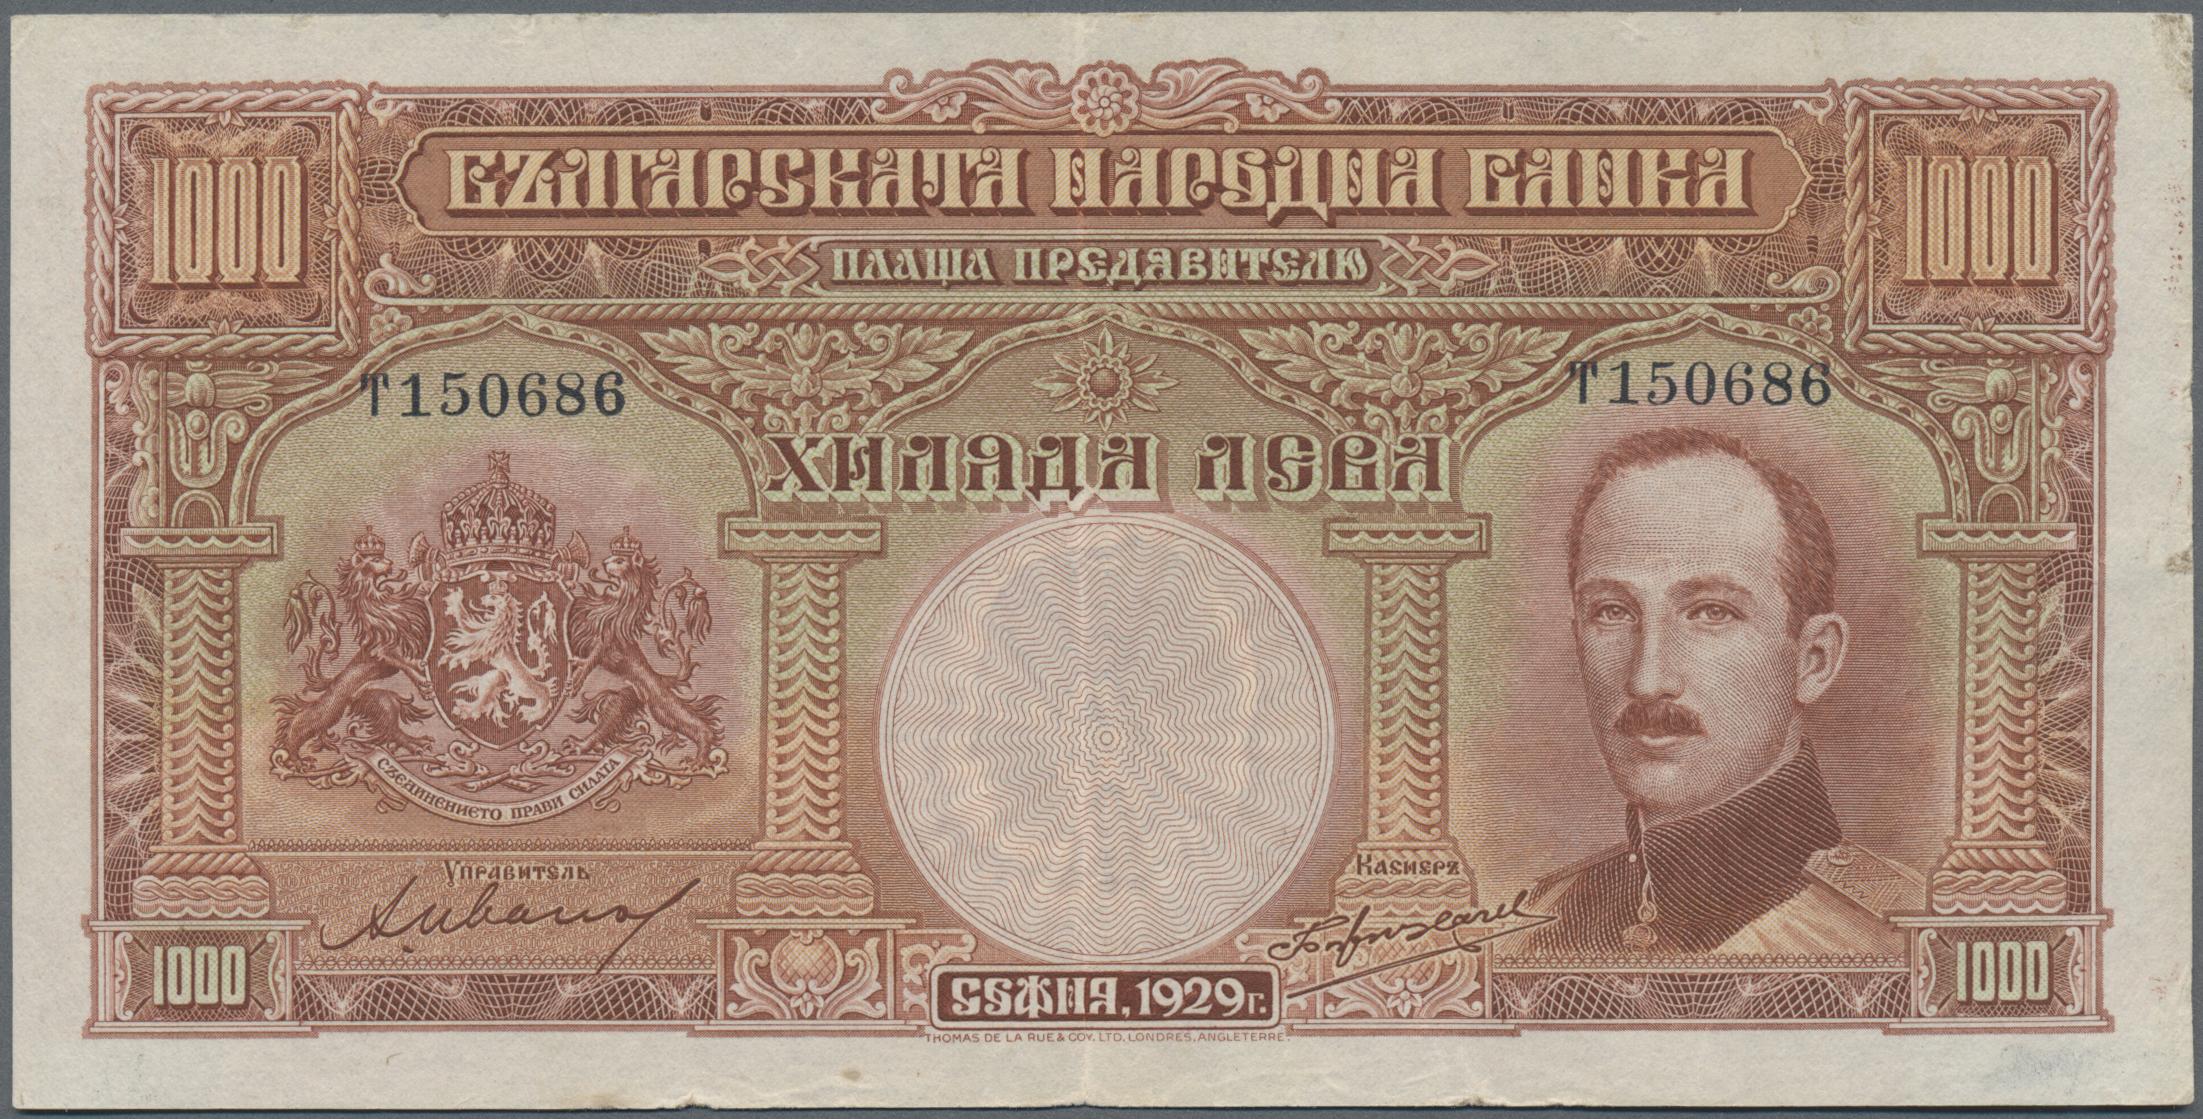 Lot 00236 - Bulgaria / Bulgarien | Banknoten  -  Auktionshaus Christoph Gärtner GmbH & Co. KG Sale #46 The Banknotes Worldwide section of the 46th Christoph Gärtner Auction